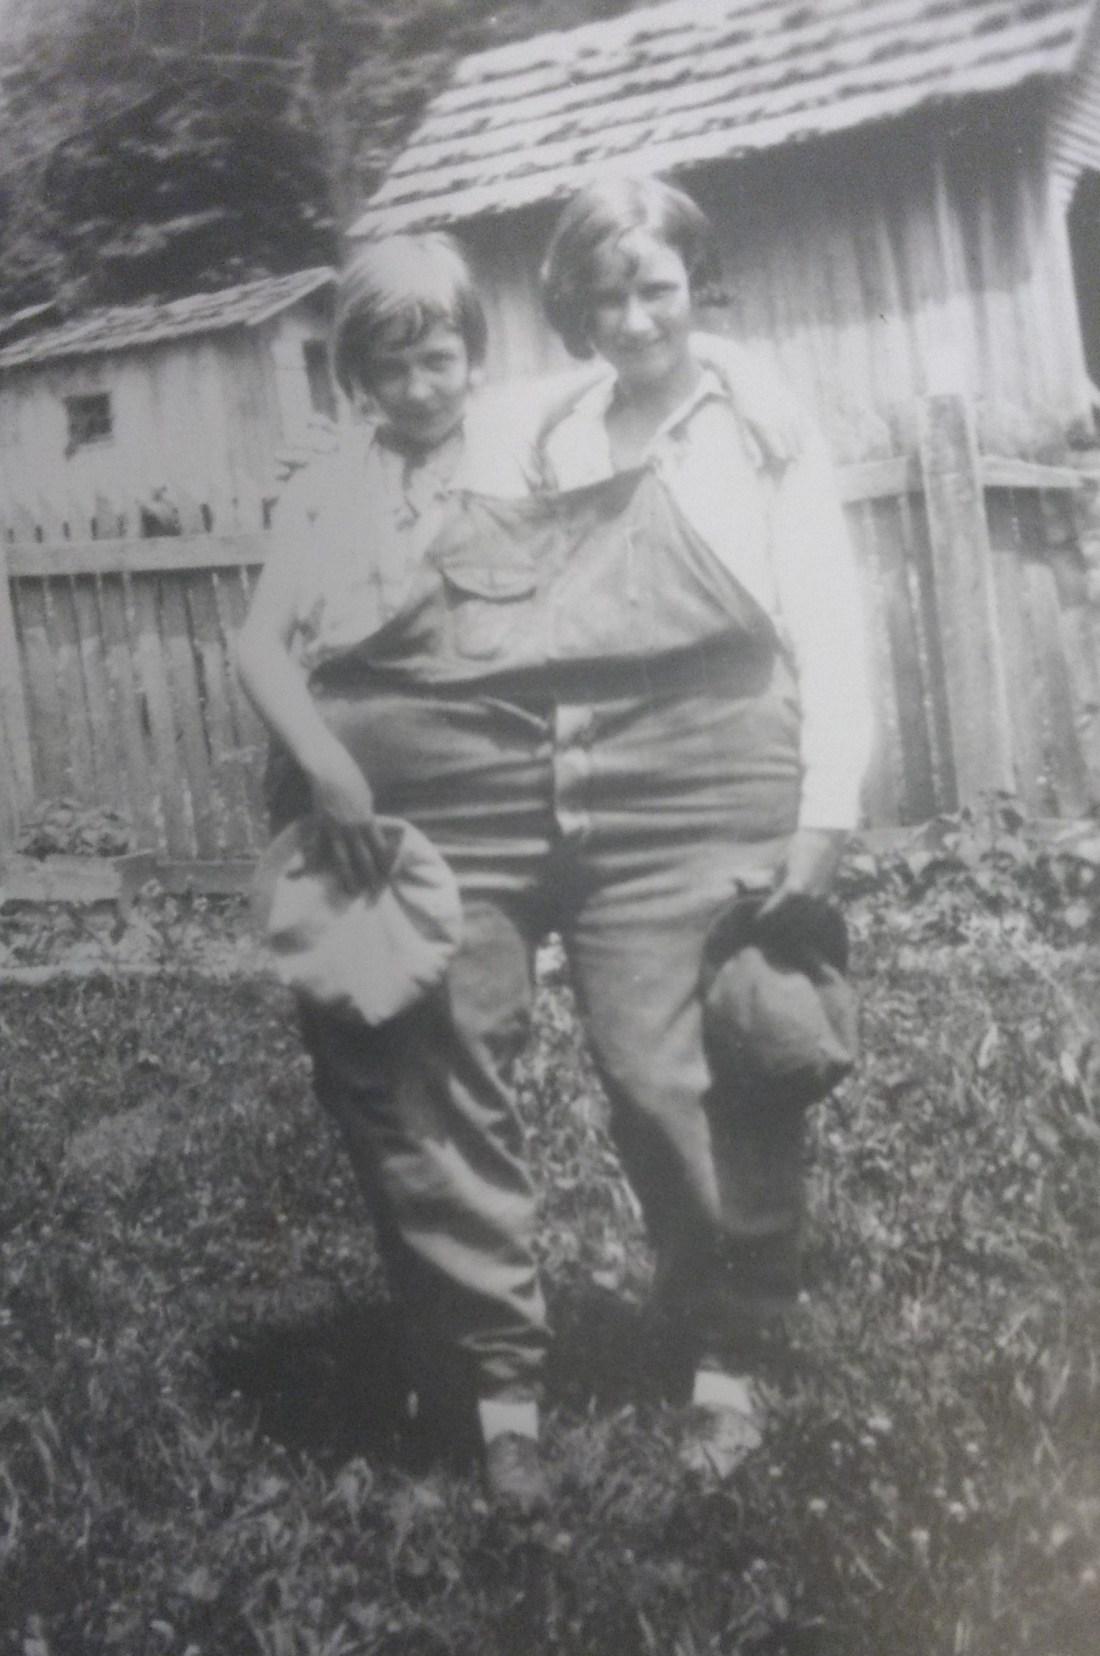 Avis Garman and Elizabeth